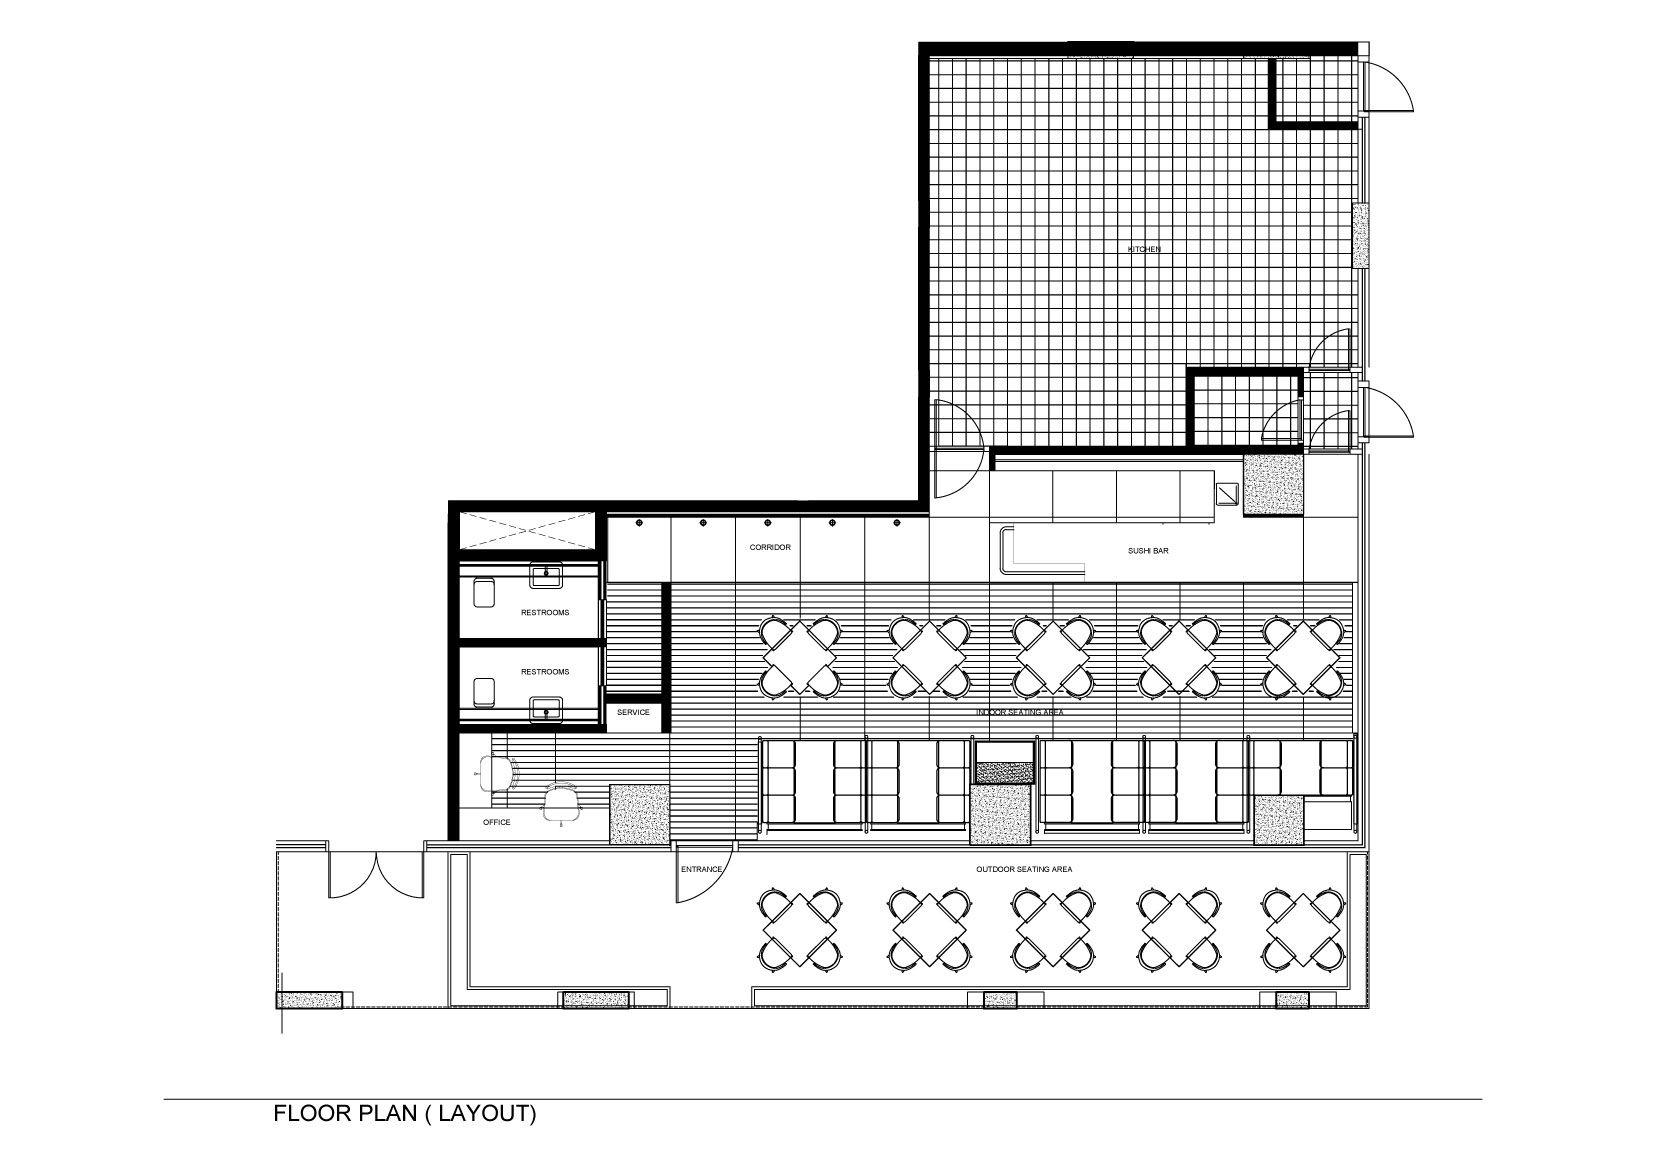 Hotel lobby furniture plan - Jassim Alshehab N I Th T Nh H Ng M Th C Nh T B N Tatami